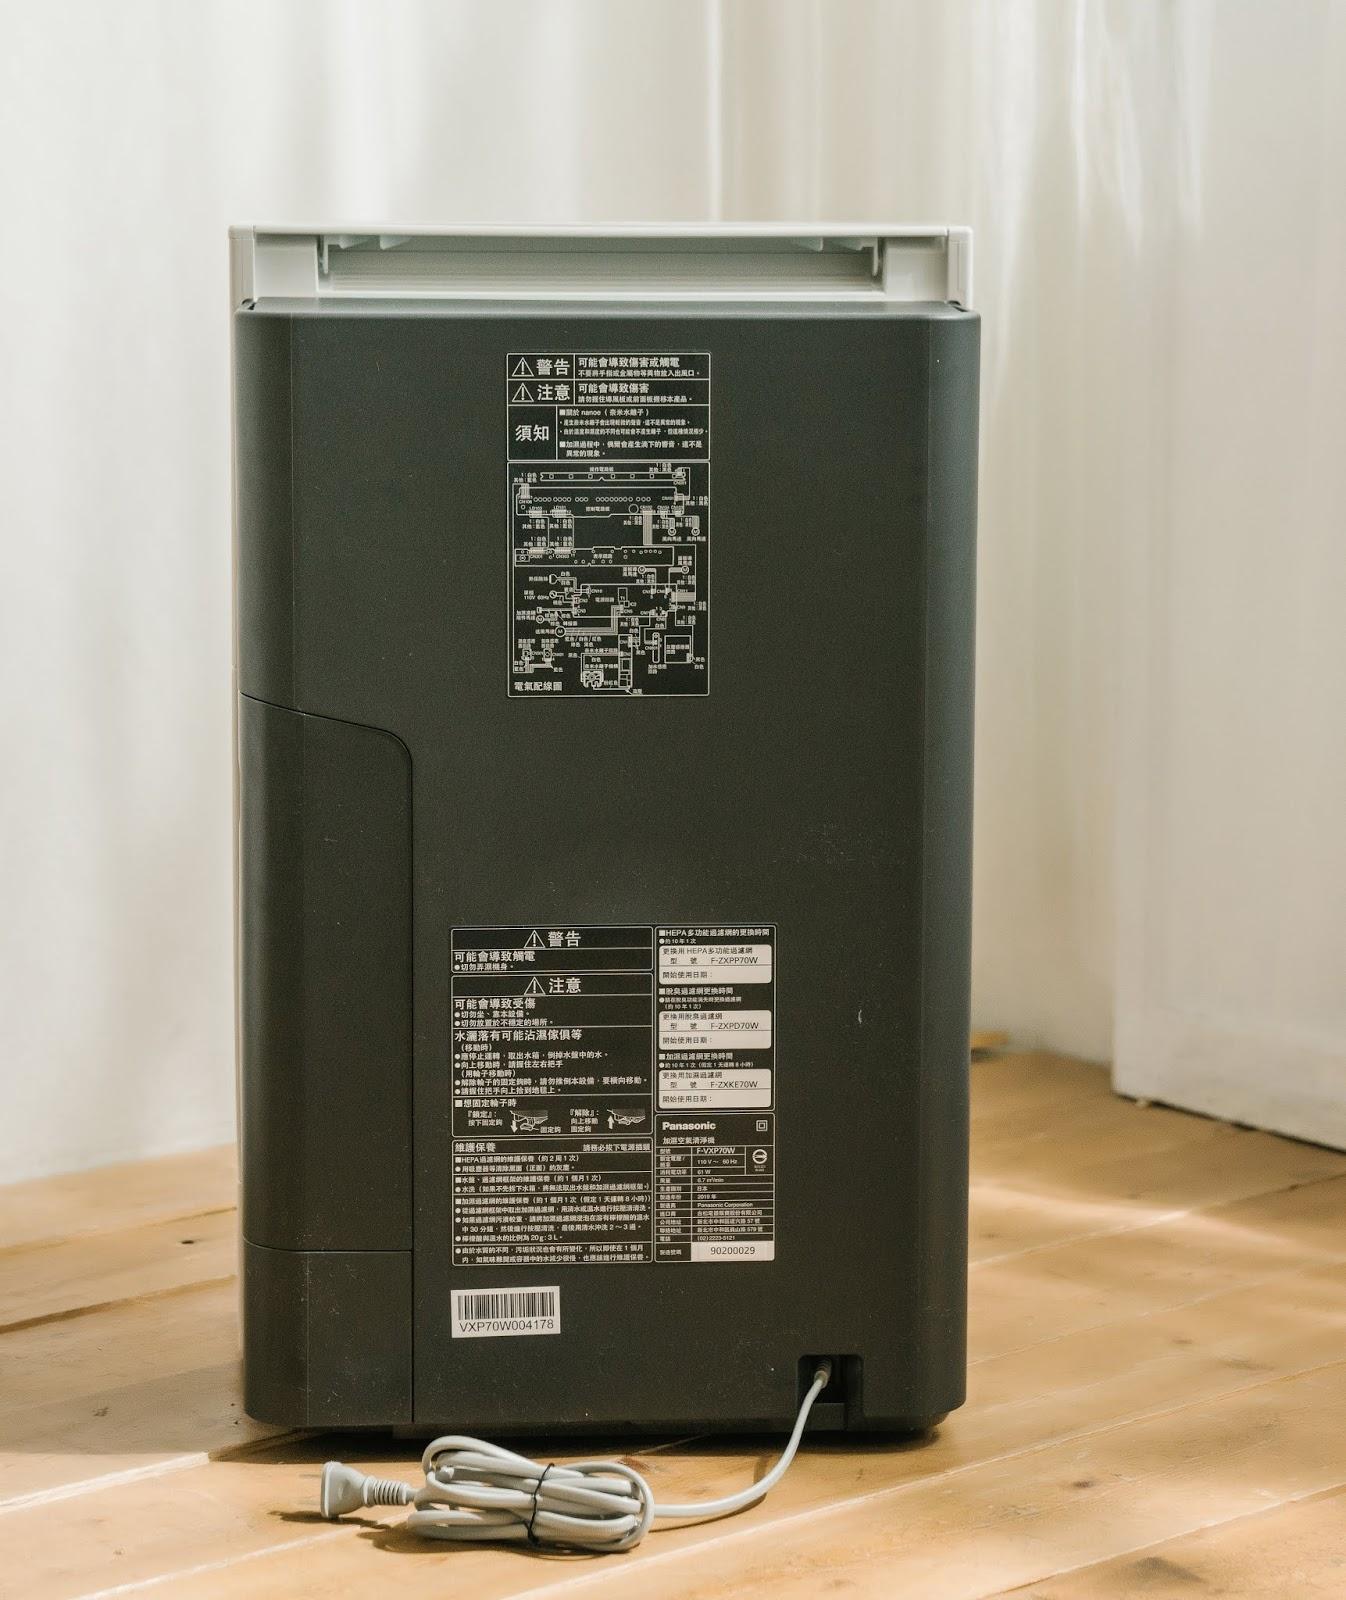 22.Panasonic_dj%25E7%2590%25A6%25E7%2590%25A6_wwwhostkikicom_%25E8%2583%258C%25E9%259D%25A2.jpg-雙重淨化室內空氣,用空氣清淨機打擊換季過敏生病